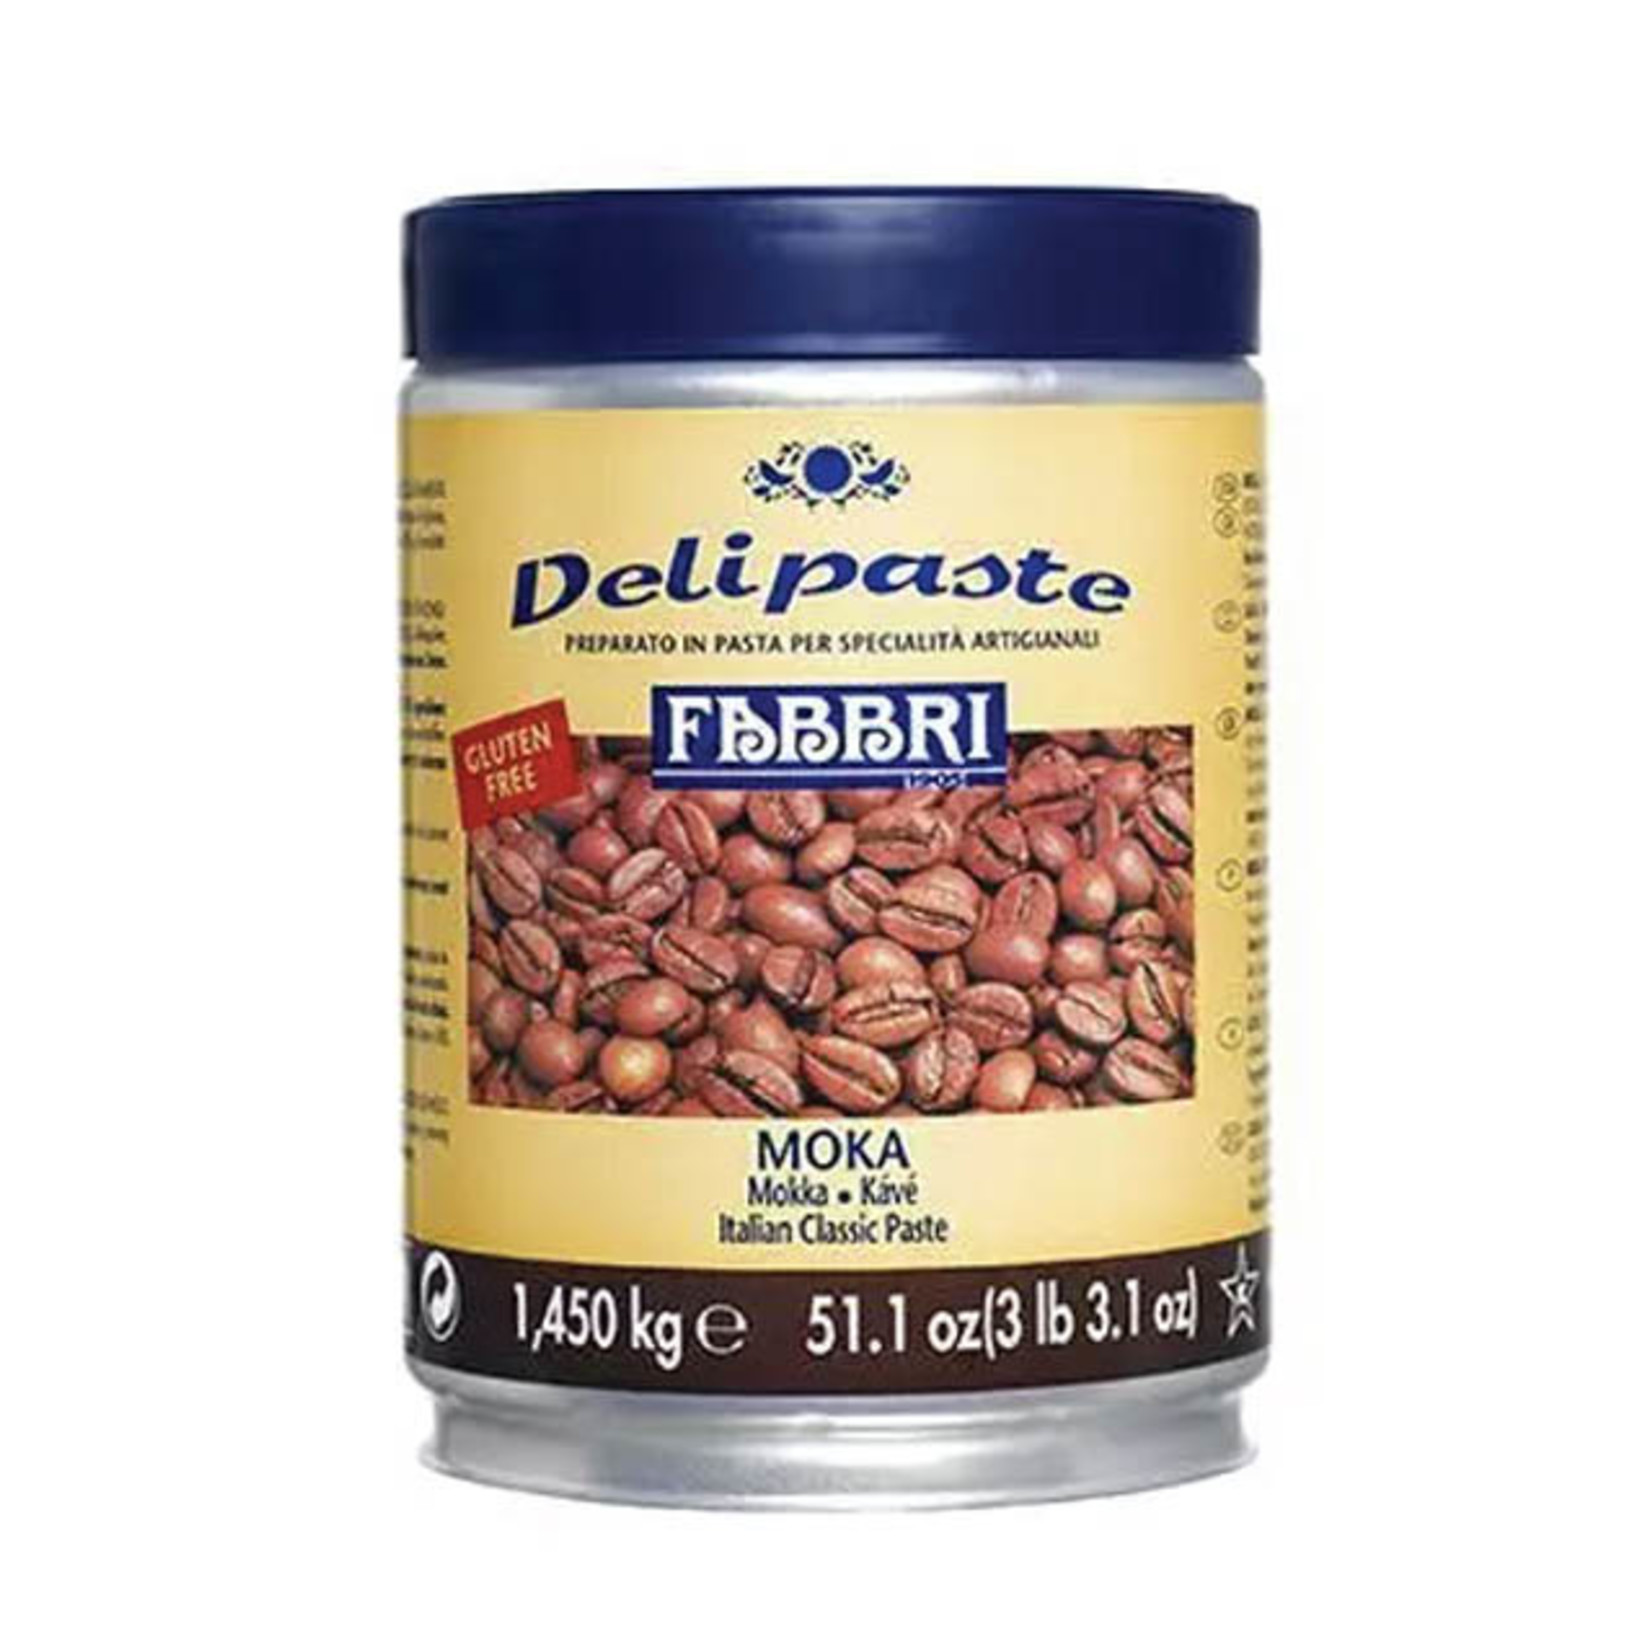 Fabbri Fabbri - Moka (Coffee) Delipaste - 1.35kg, 9225435-7BB